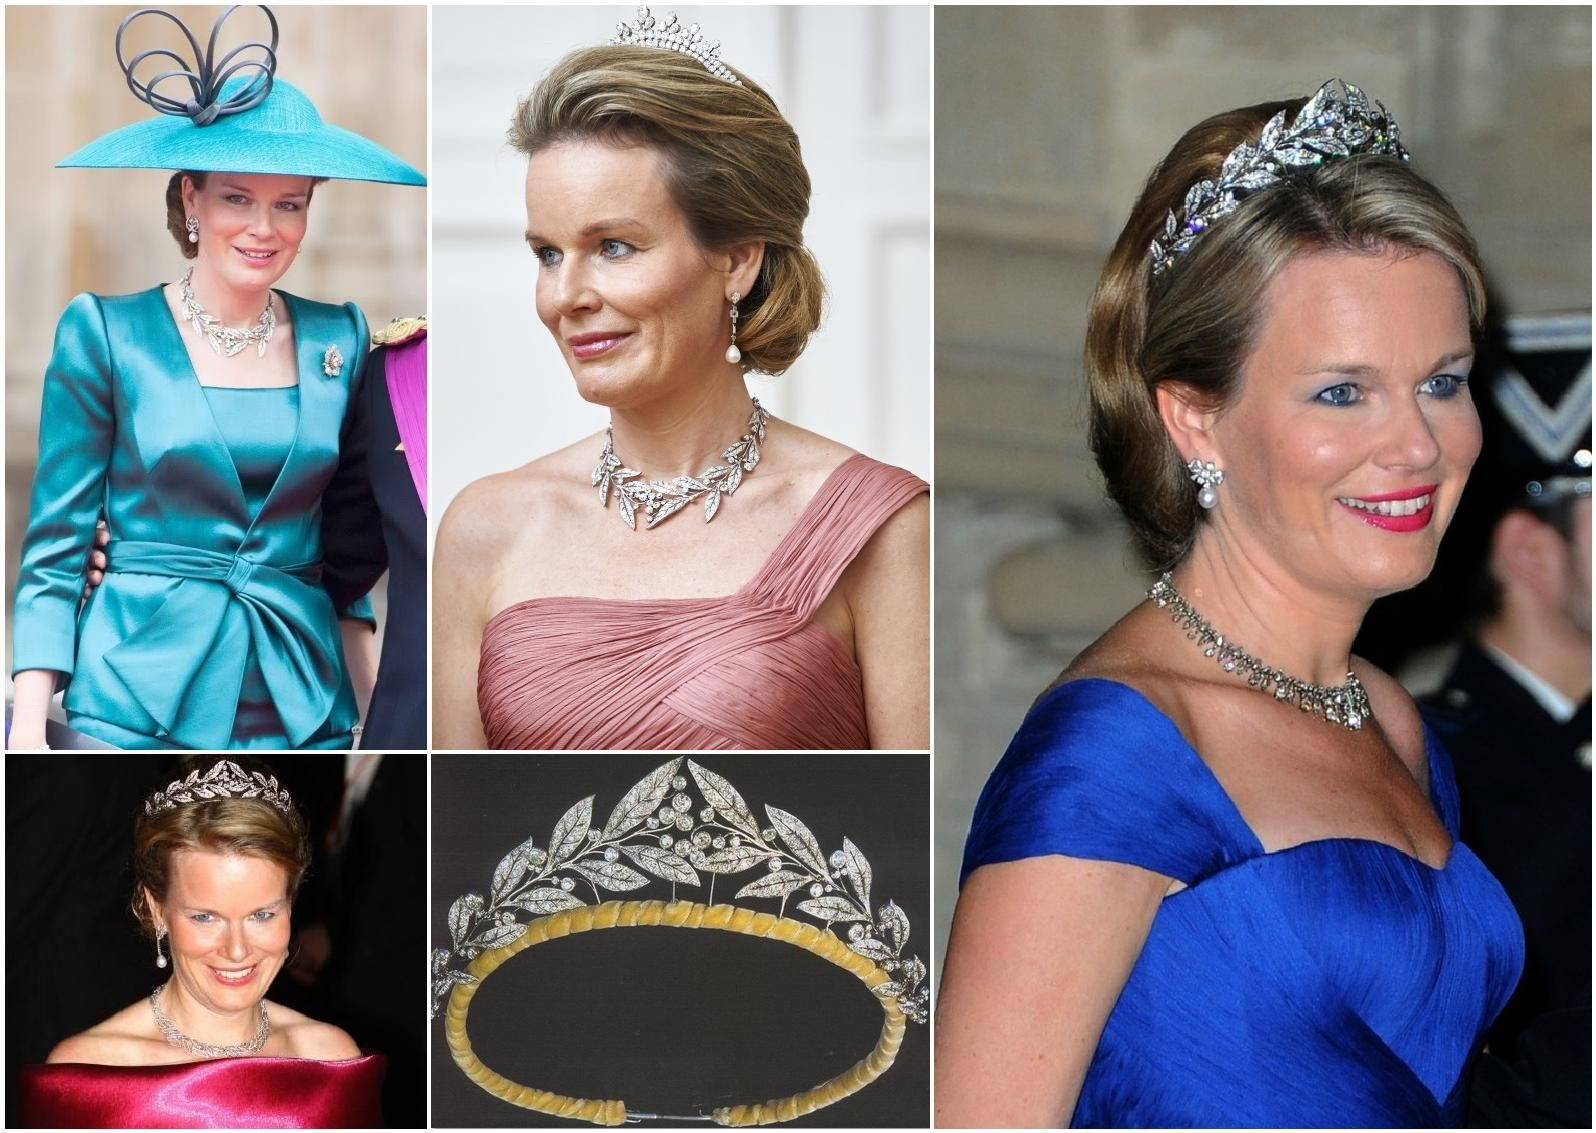 A Classic Belgian Wedding: The Brabant Laurel Wreath Tiara. Made By London Jewelers